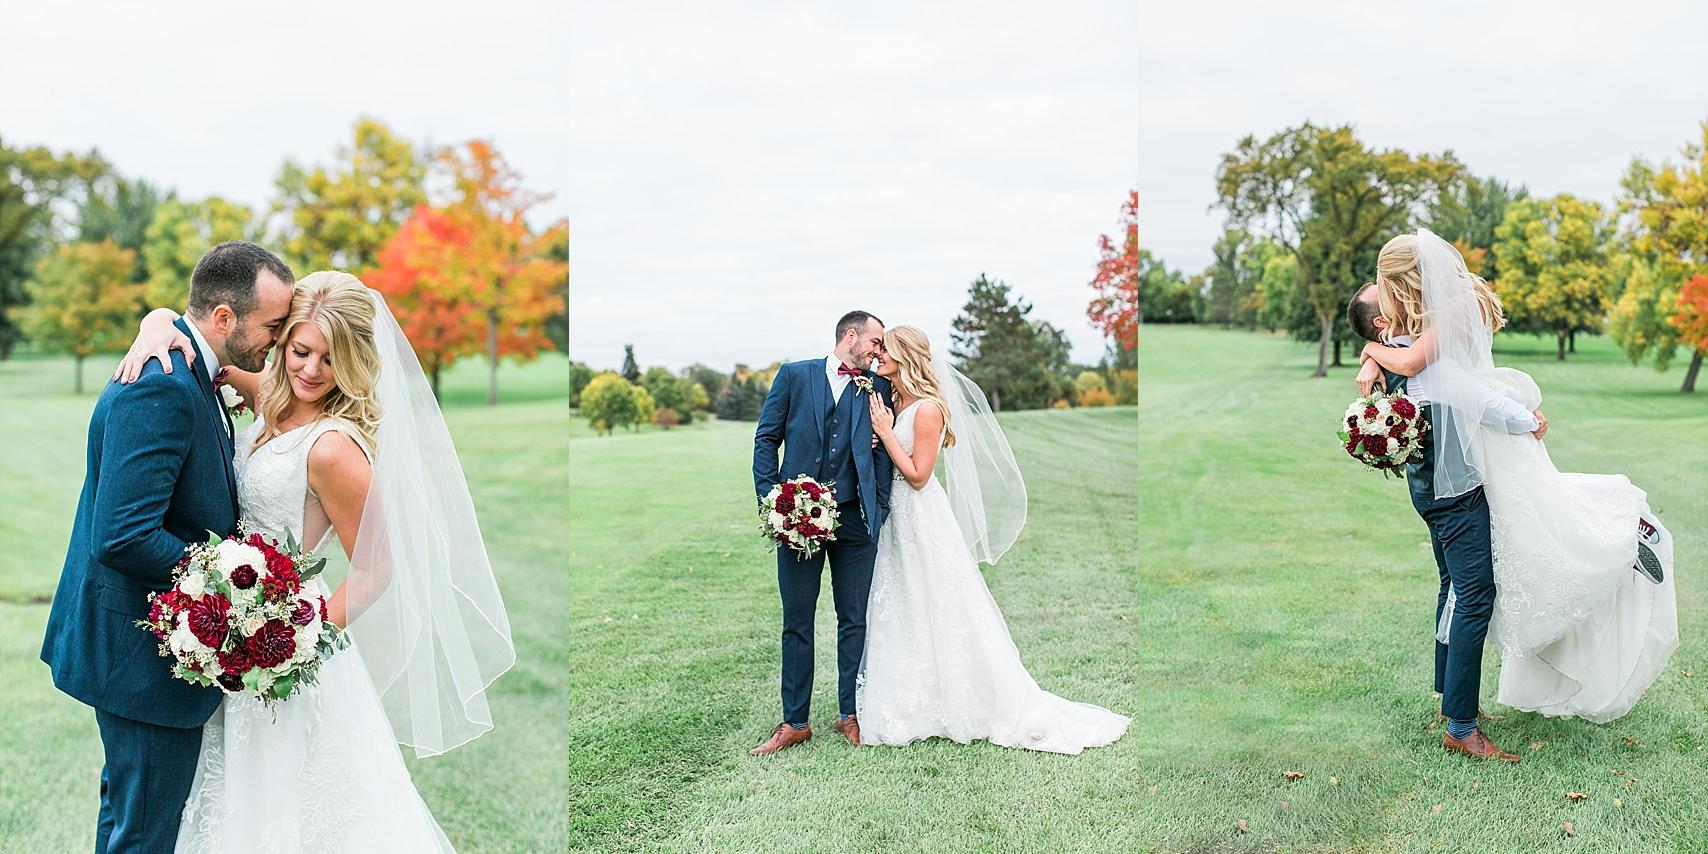 Minnesota Minneapolis Wedding Photographer Best Of 2018 Weddings Mallory Kiesow Photography_0180.jpg